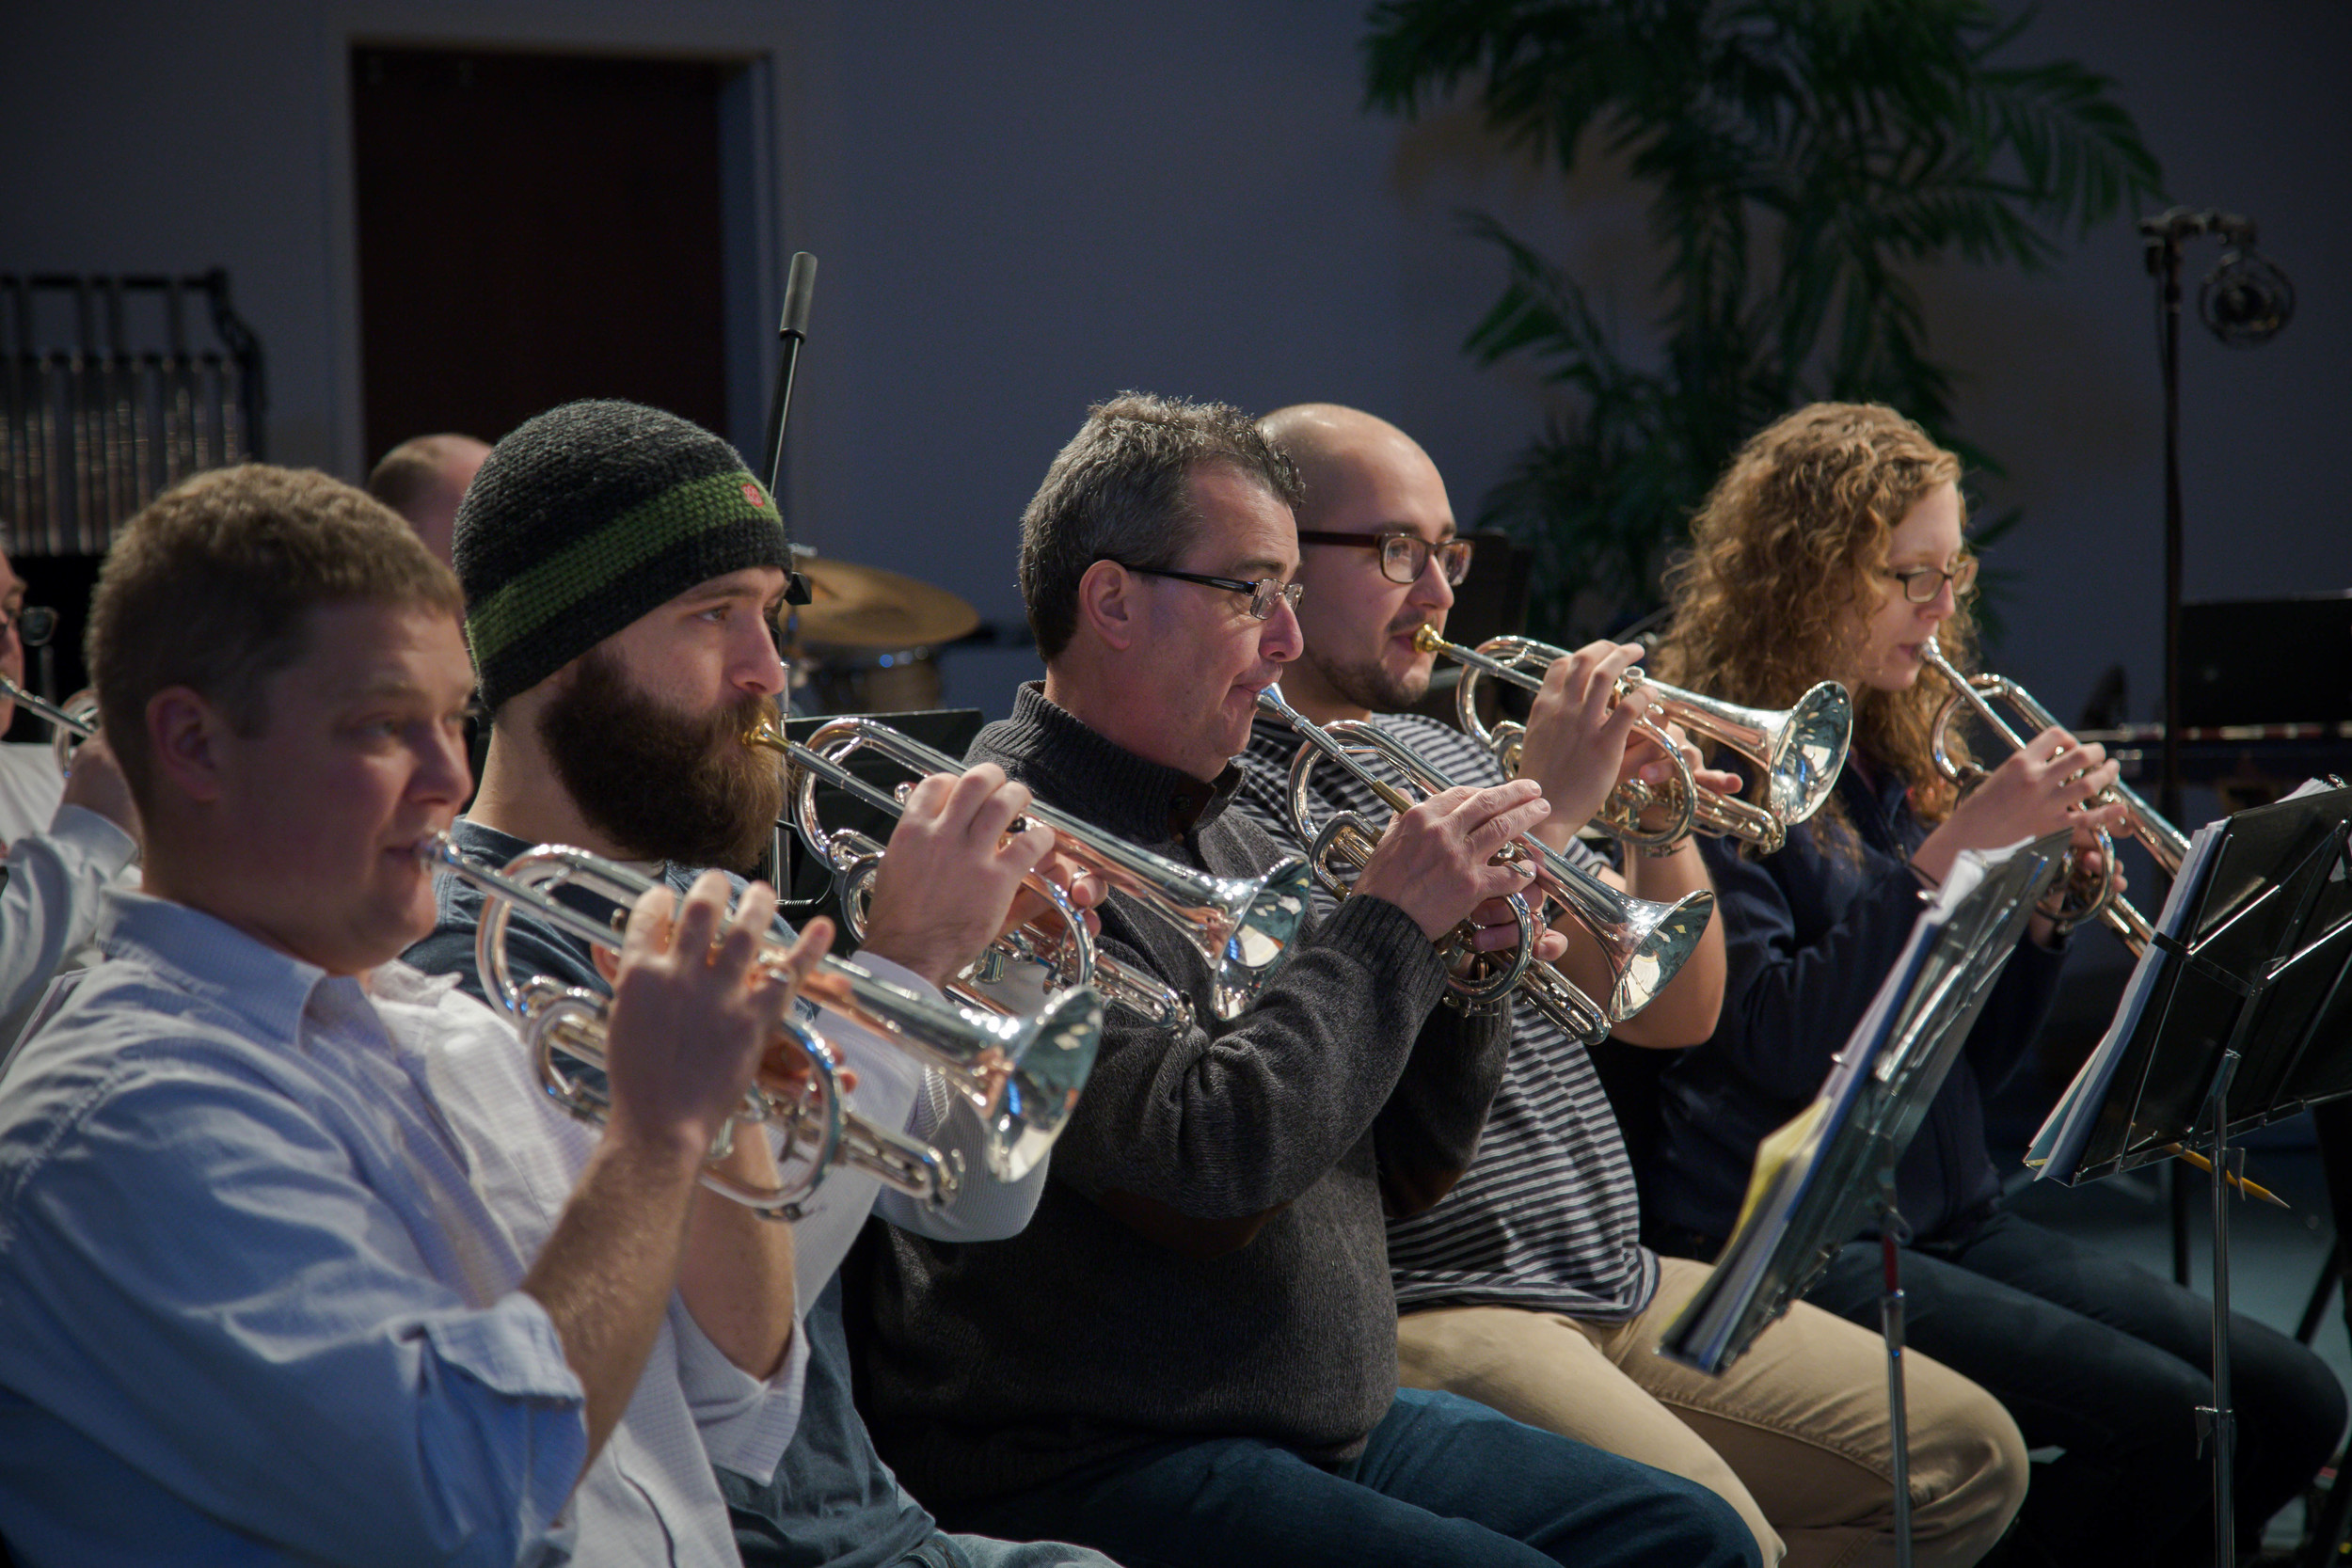 Front row cornets: Jeff Barrington, David Delaney, Lars-Otto Ljungholm, Manny Munoz, Sara Elliott